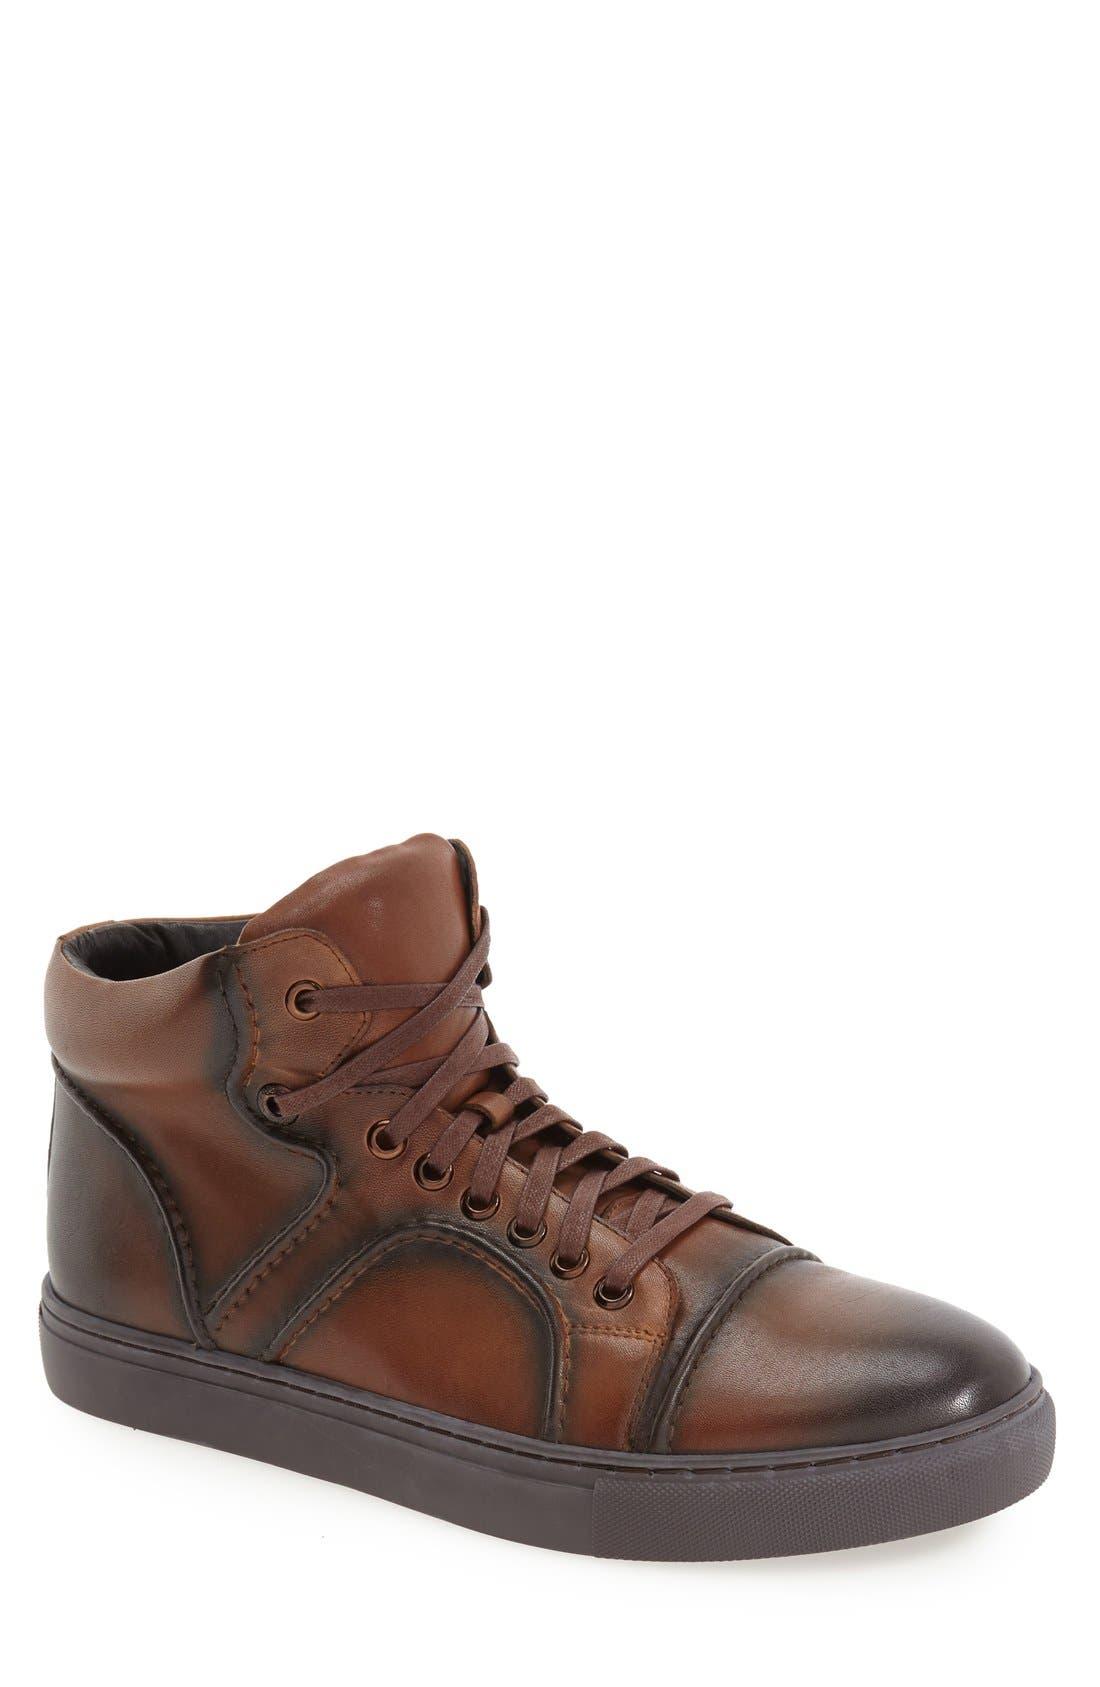 Alternate Image 1 Selected - Zanzara Vinyl Sneaker (Men)